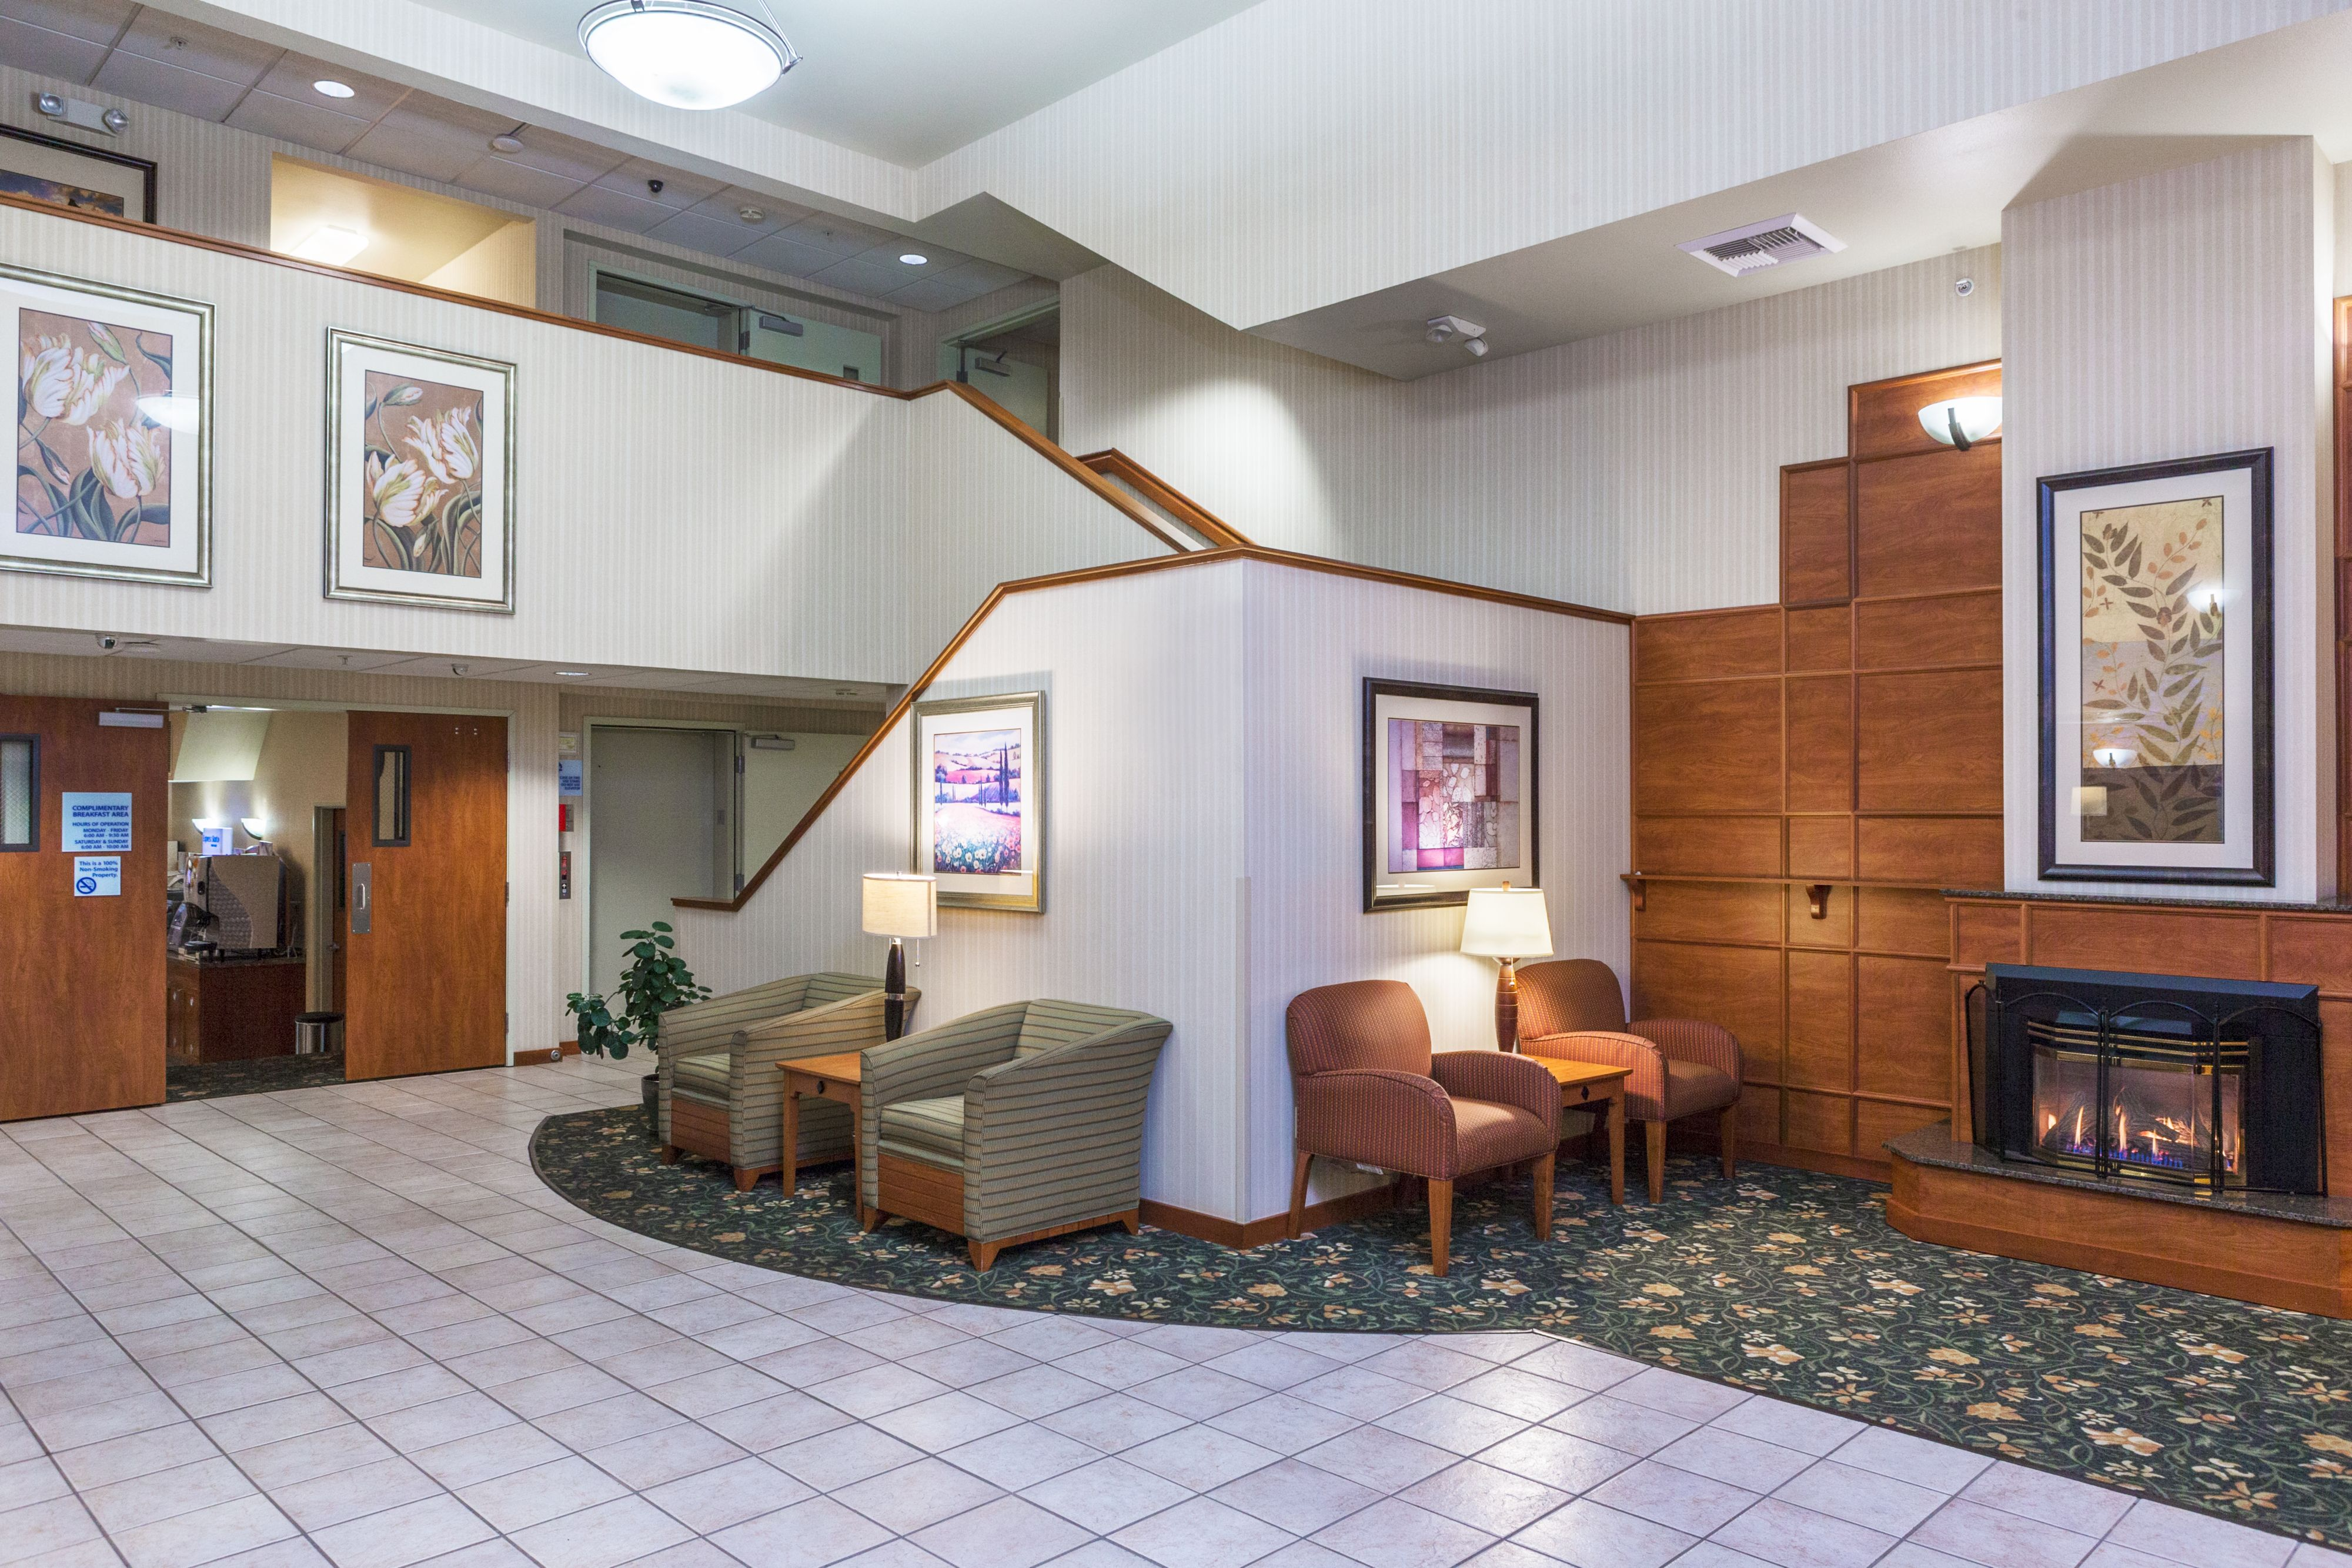 Holiday Inn Express & Suites Burlington image 6